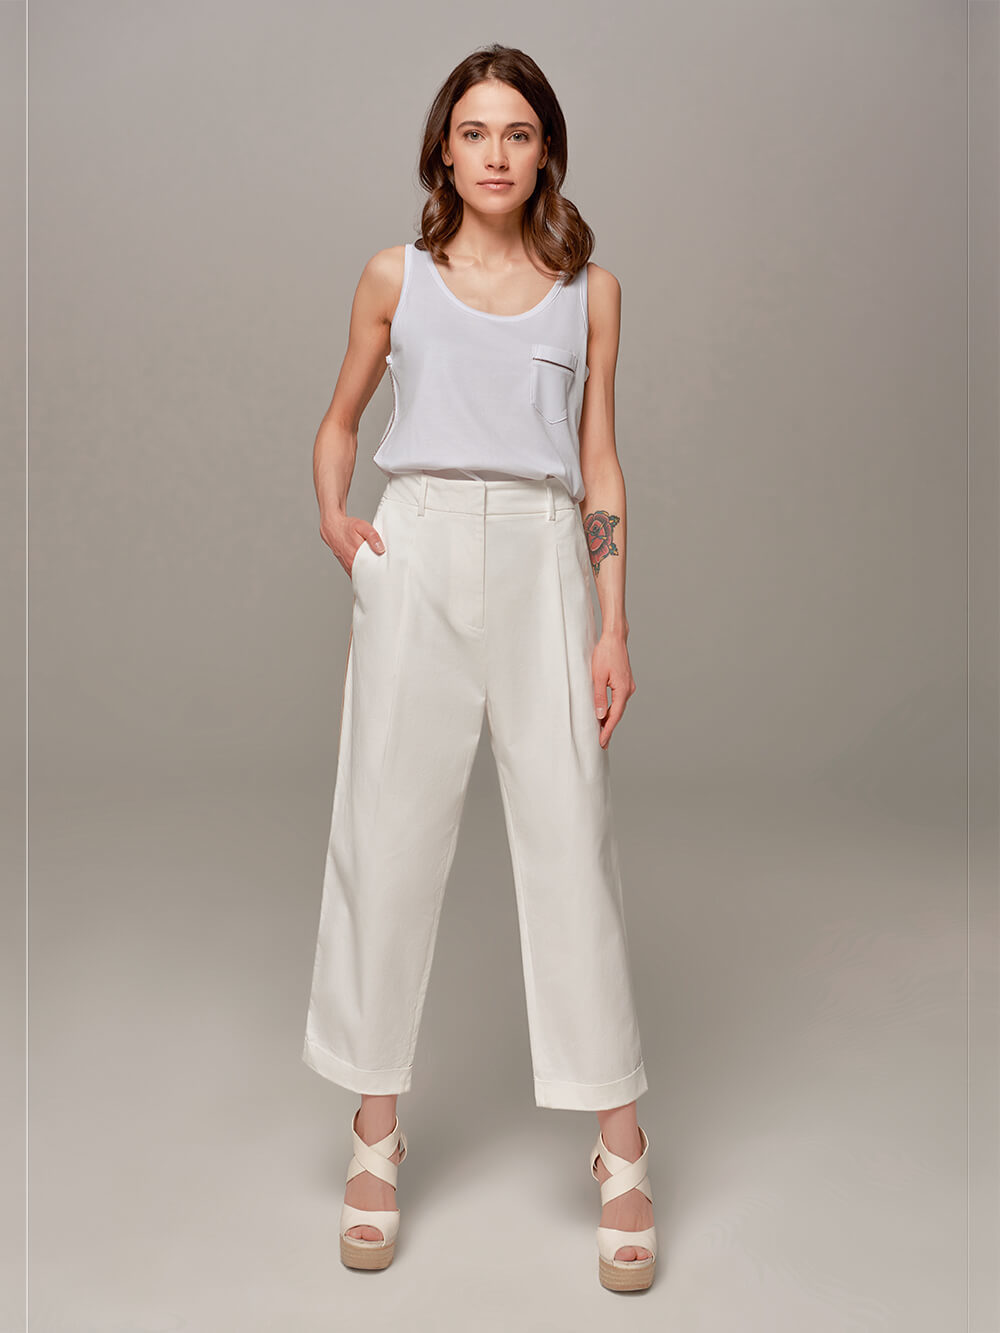 Женские белые брюки Eleventy - фото 1